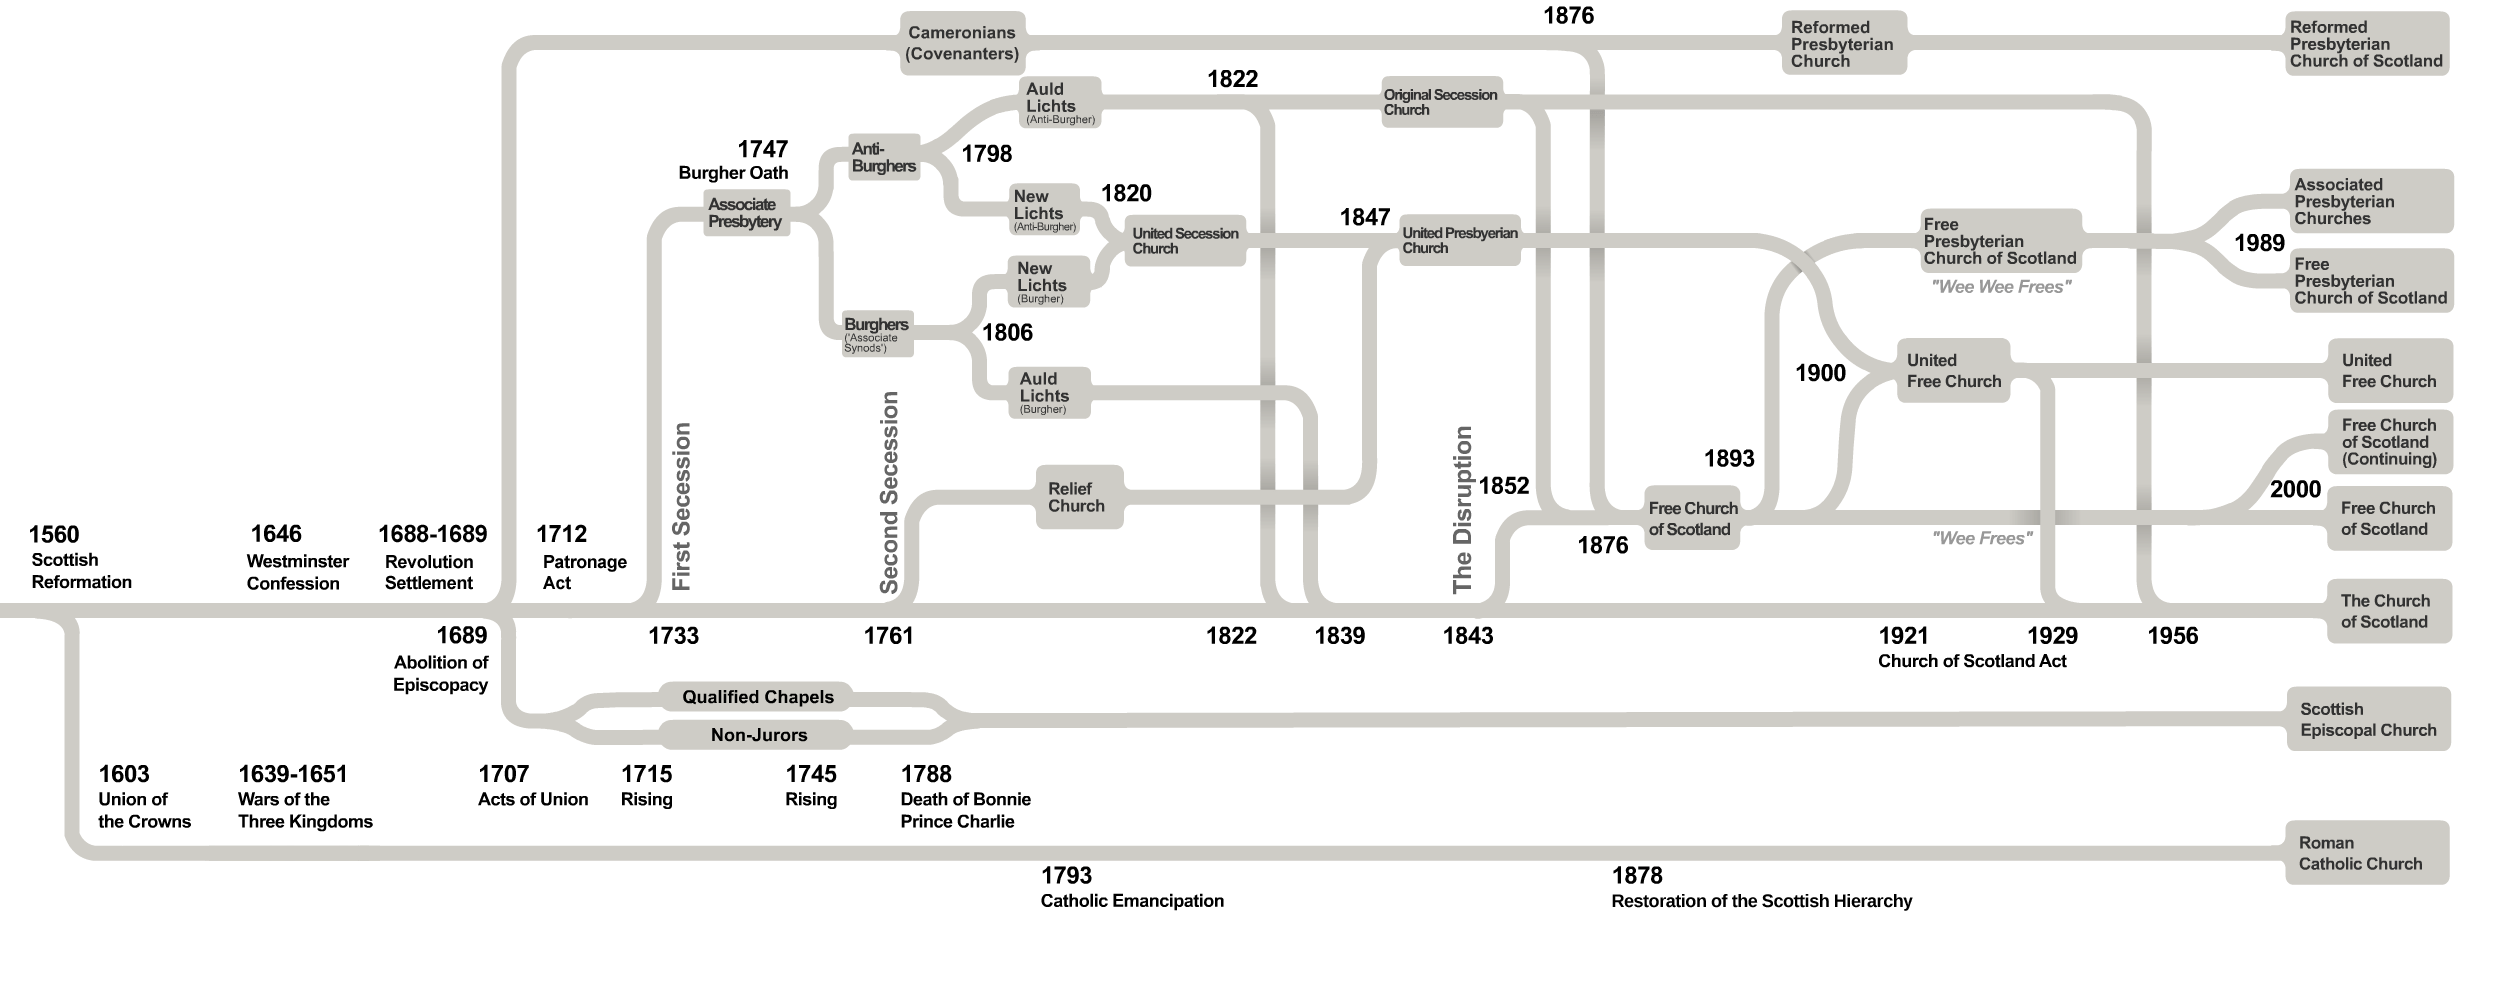 File Churches Of Scotland Timeline